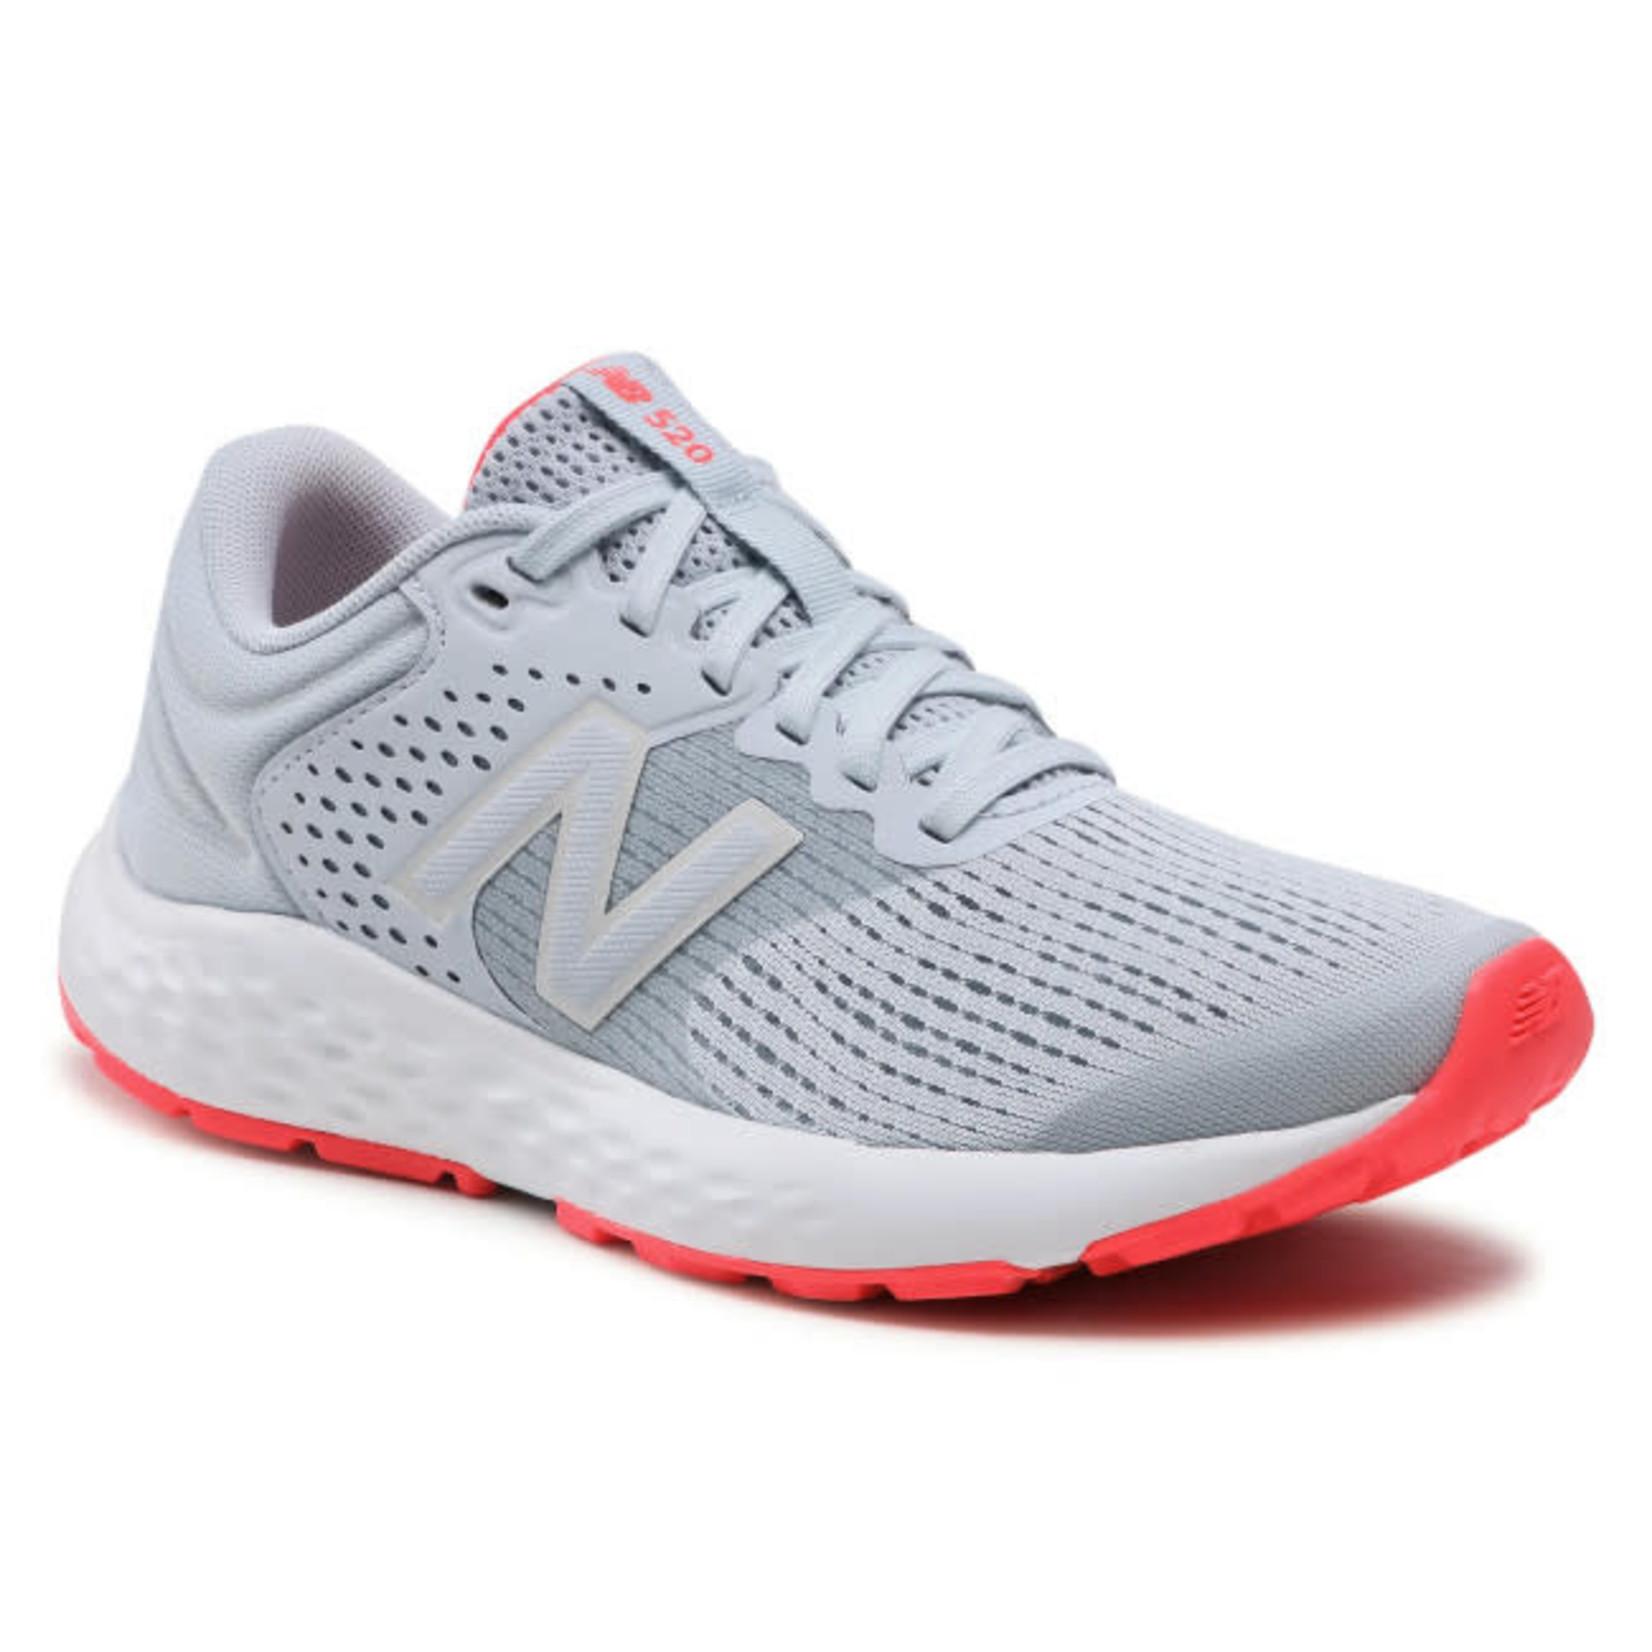 New Balance New Balance Running Shoes, W520LG7, Ladies